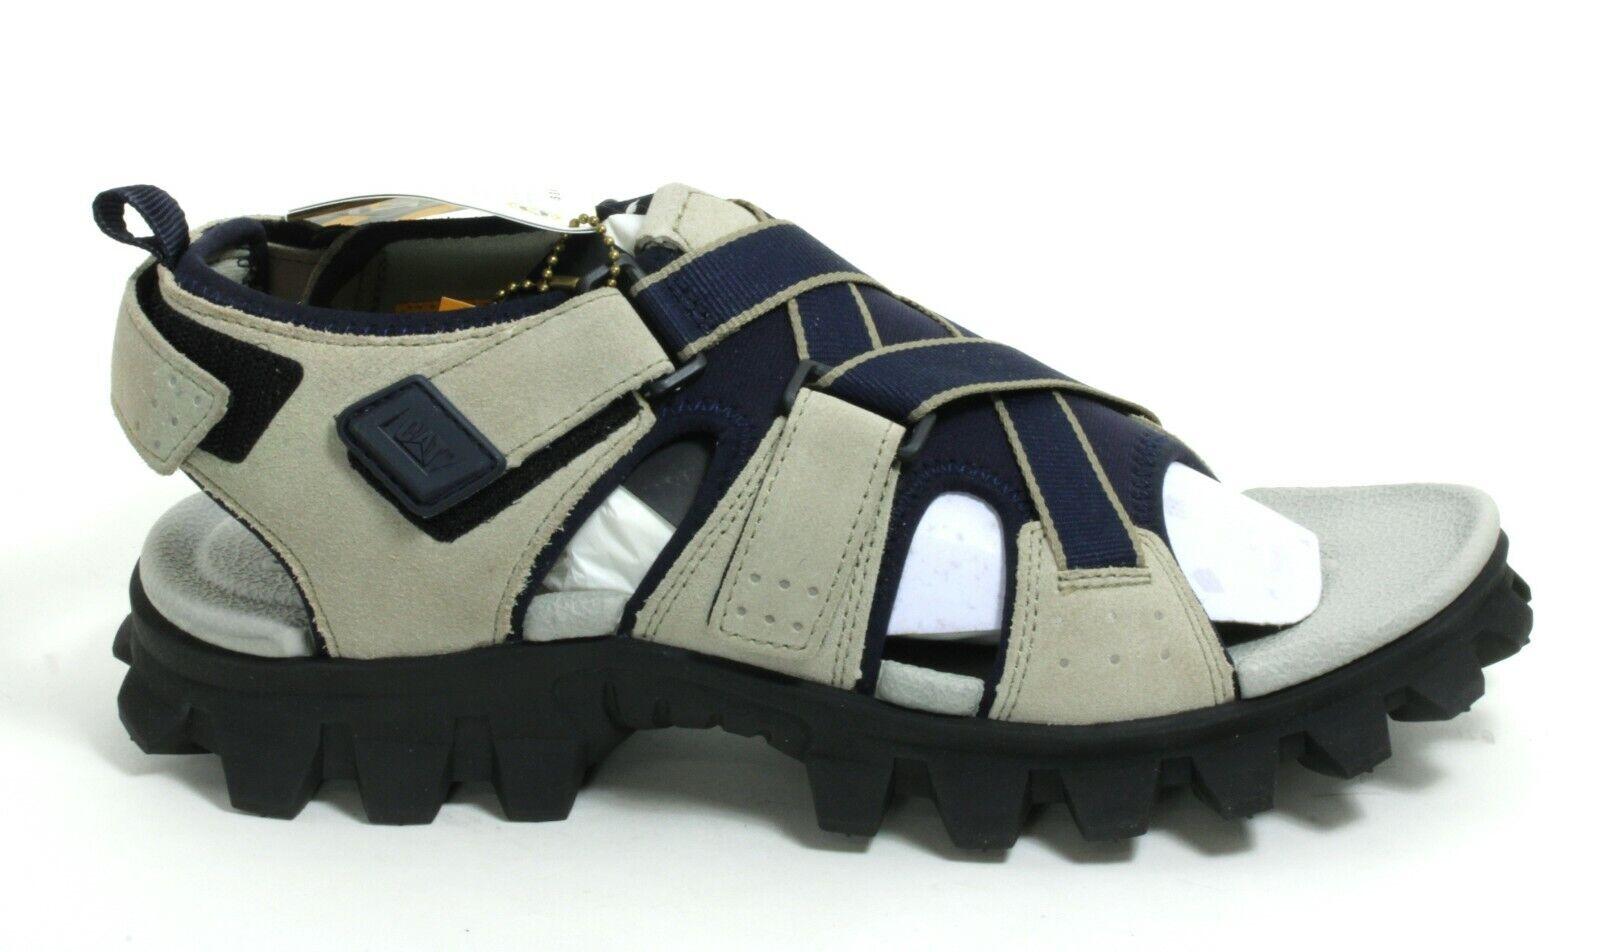 669 Sandal Trekking Touch Fastener Outdoor Shoes Summer Leather Caterpillar 42